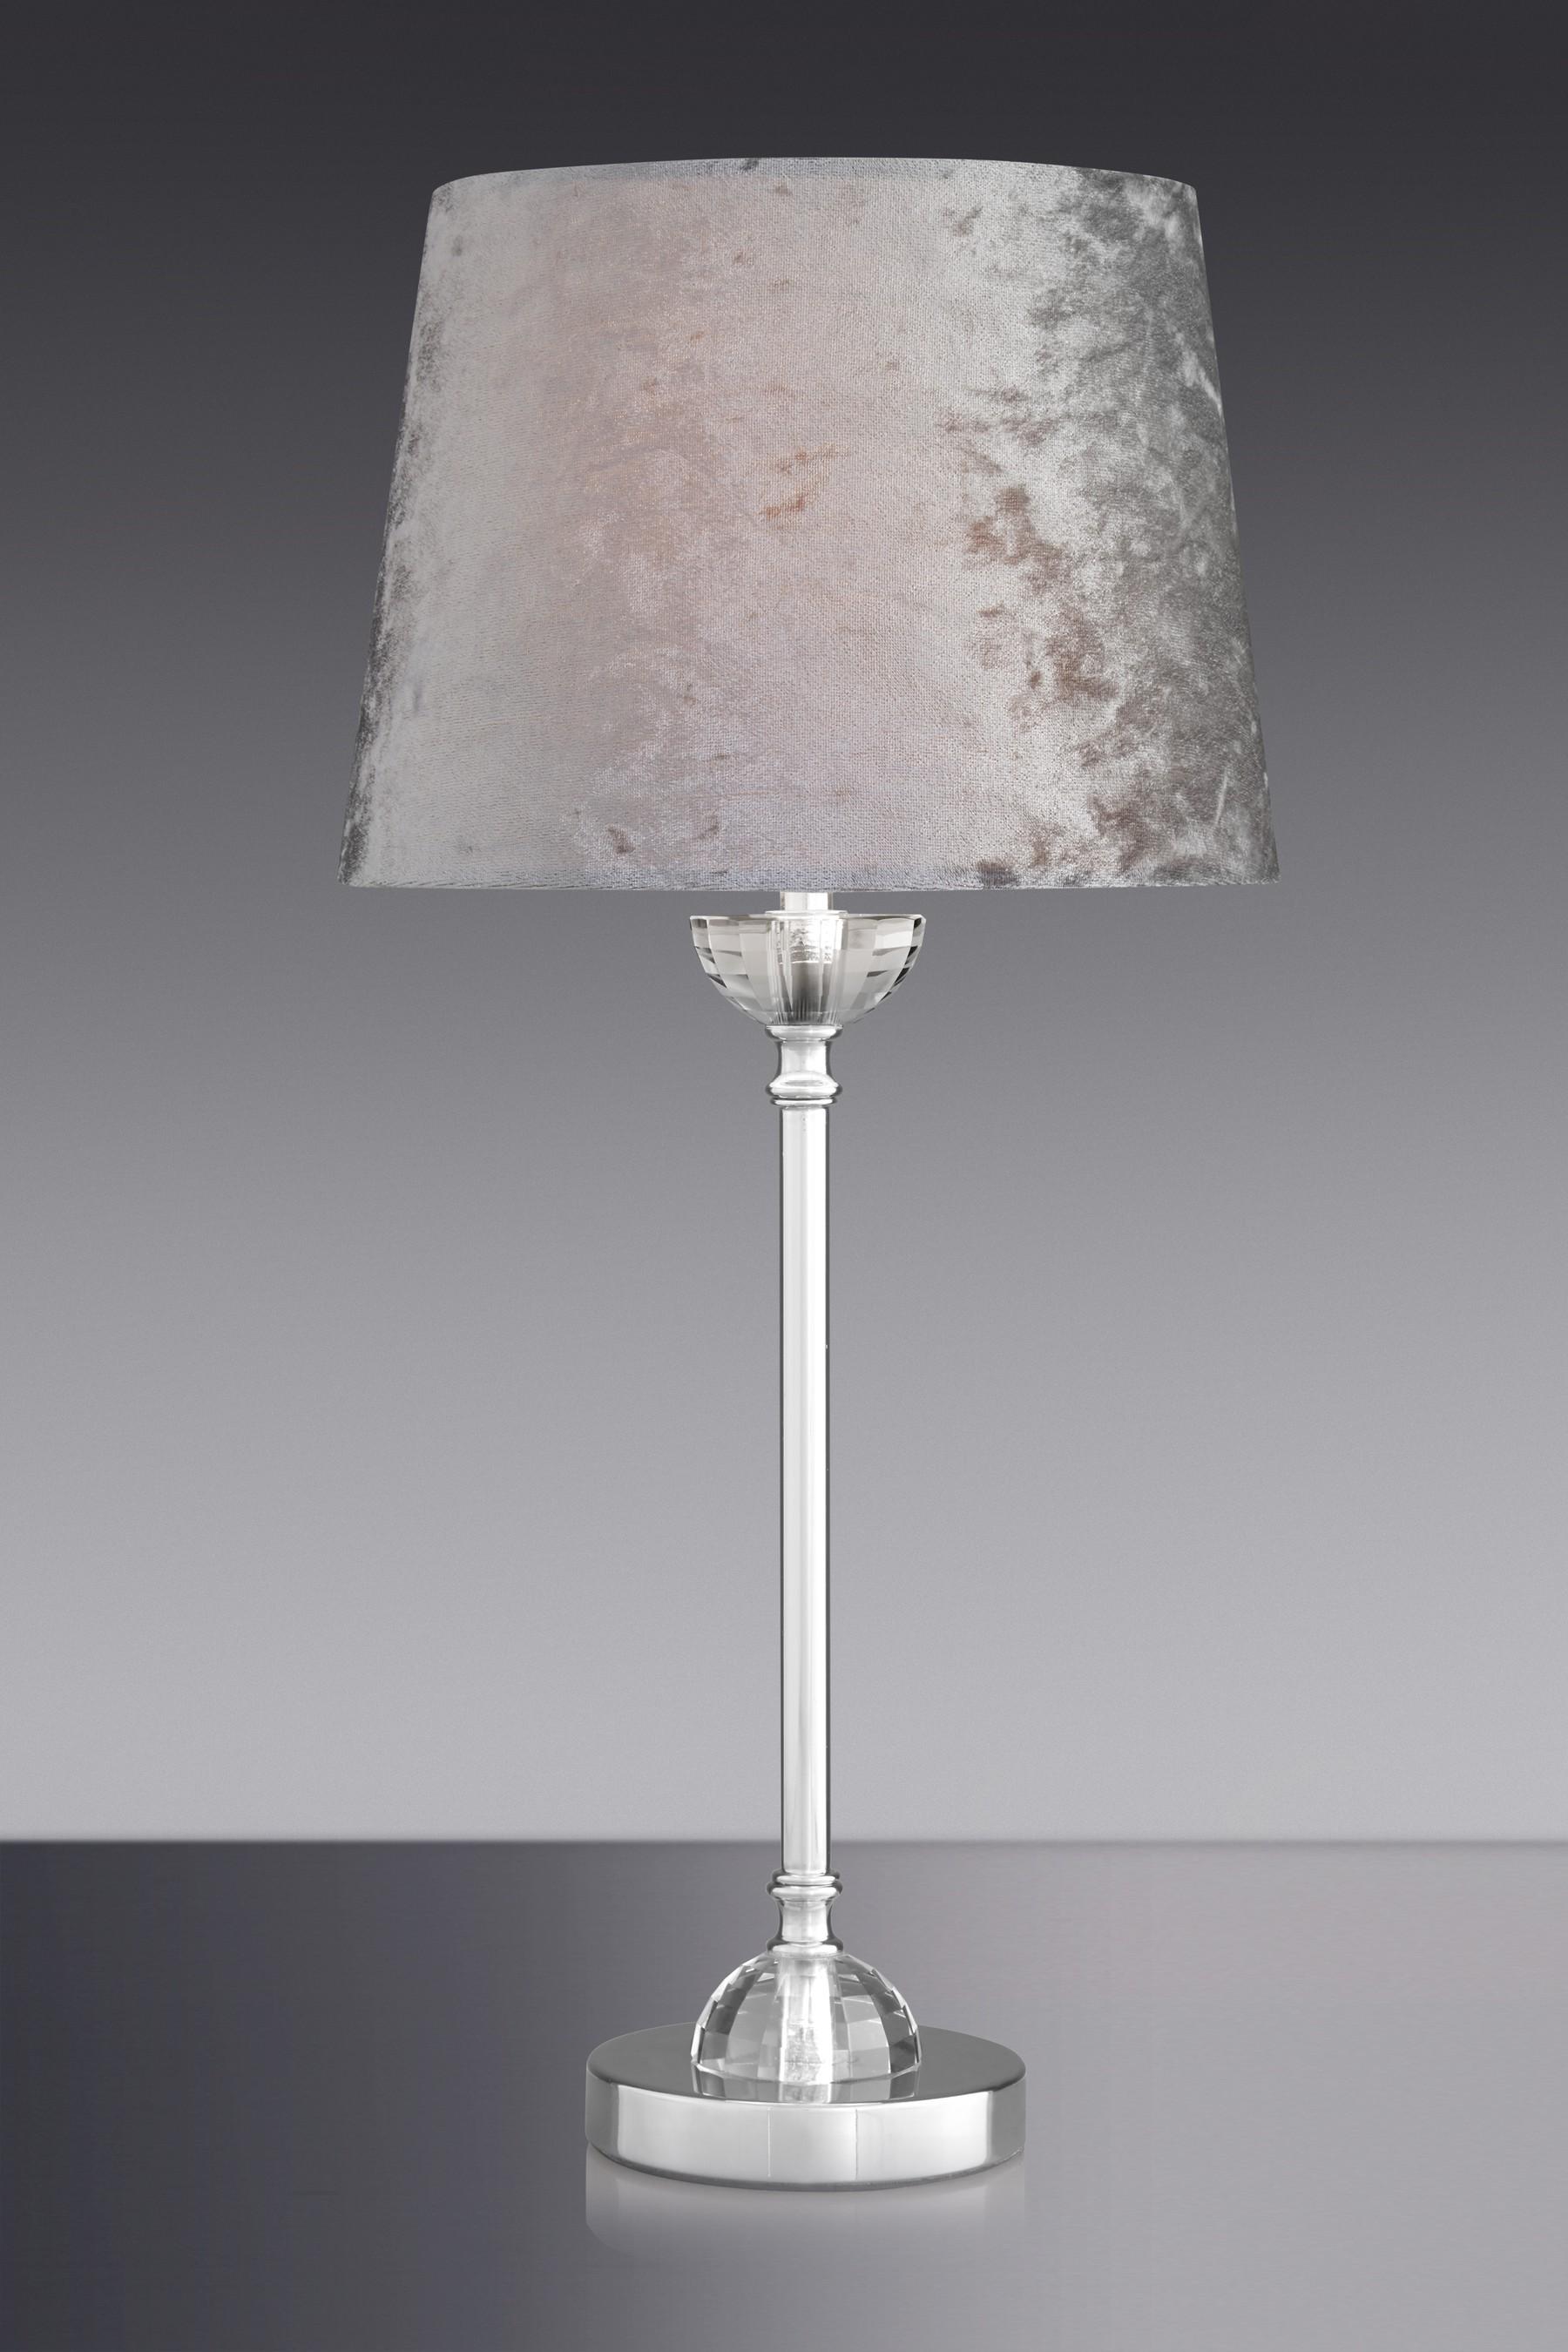 Next Velvet Table Lamp Grey Lamp Table Lamp Grey Table Lamps